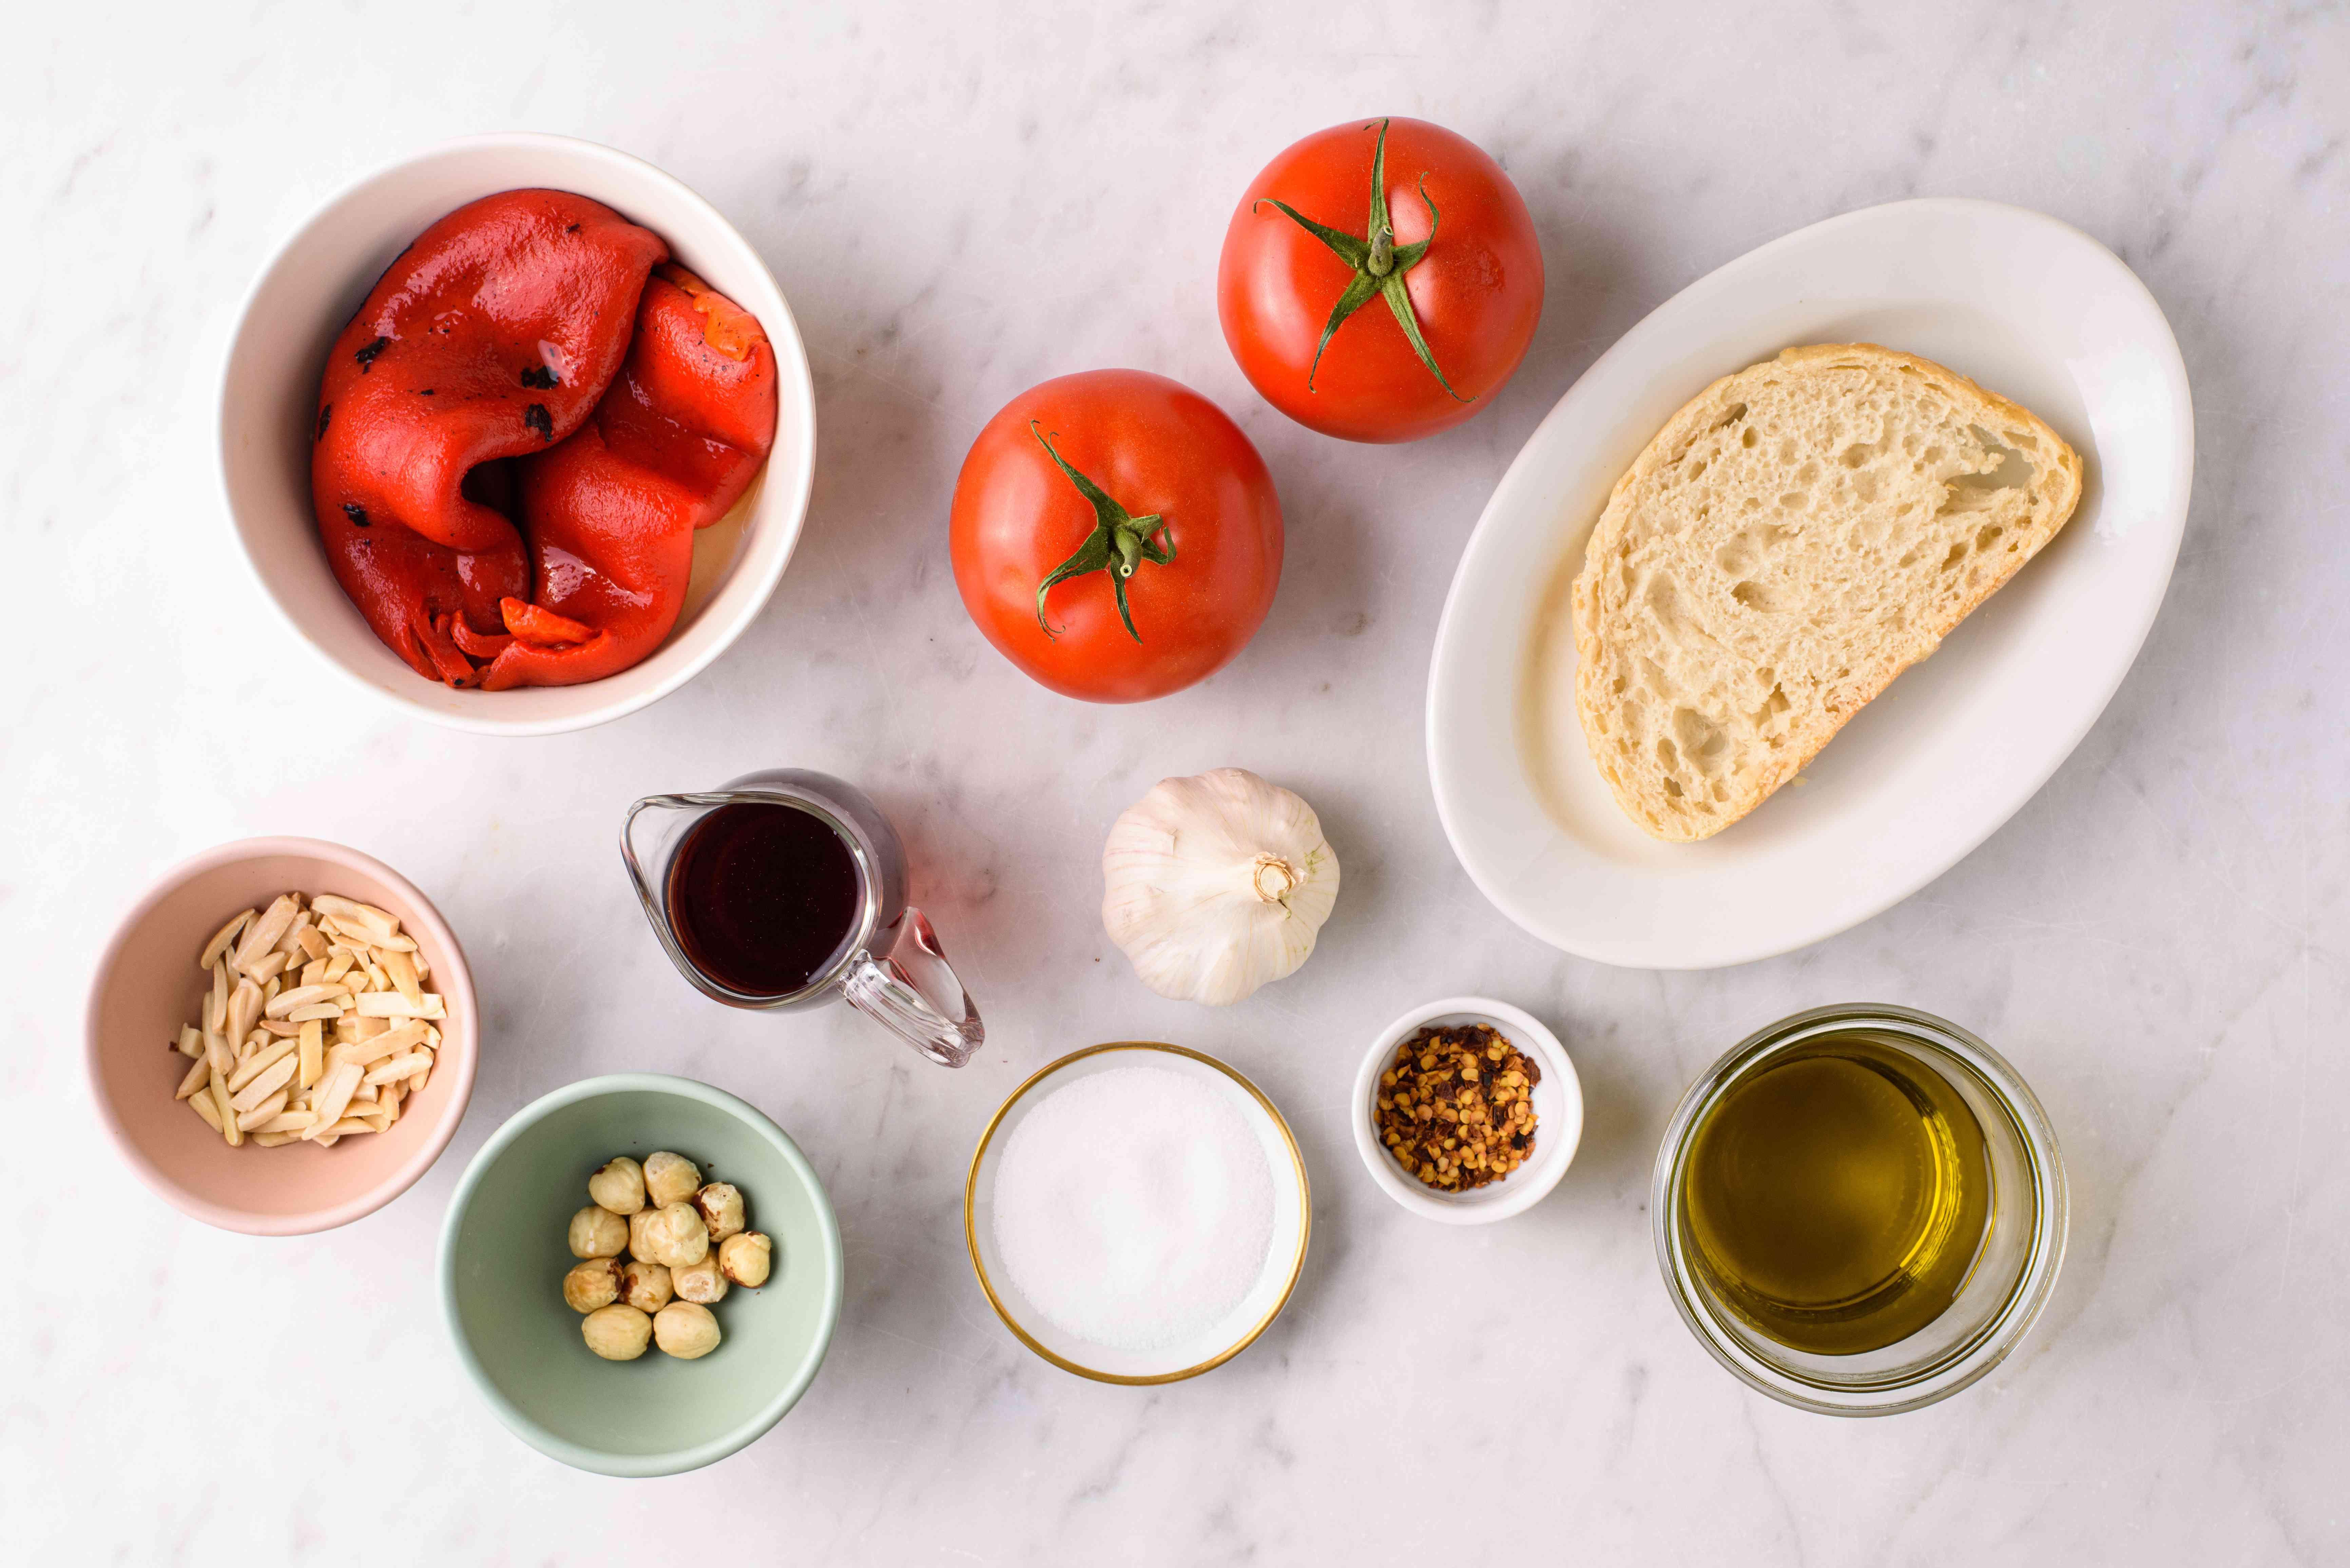 Ingredients for romesco sauce